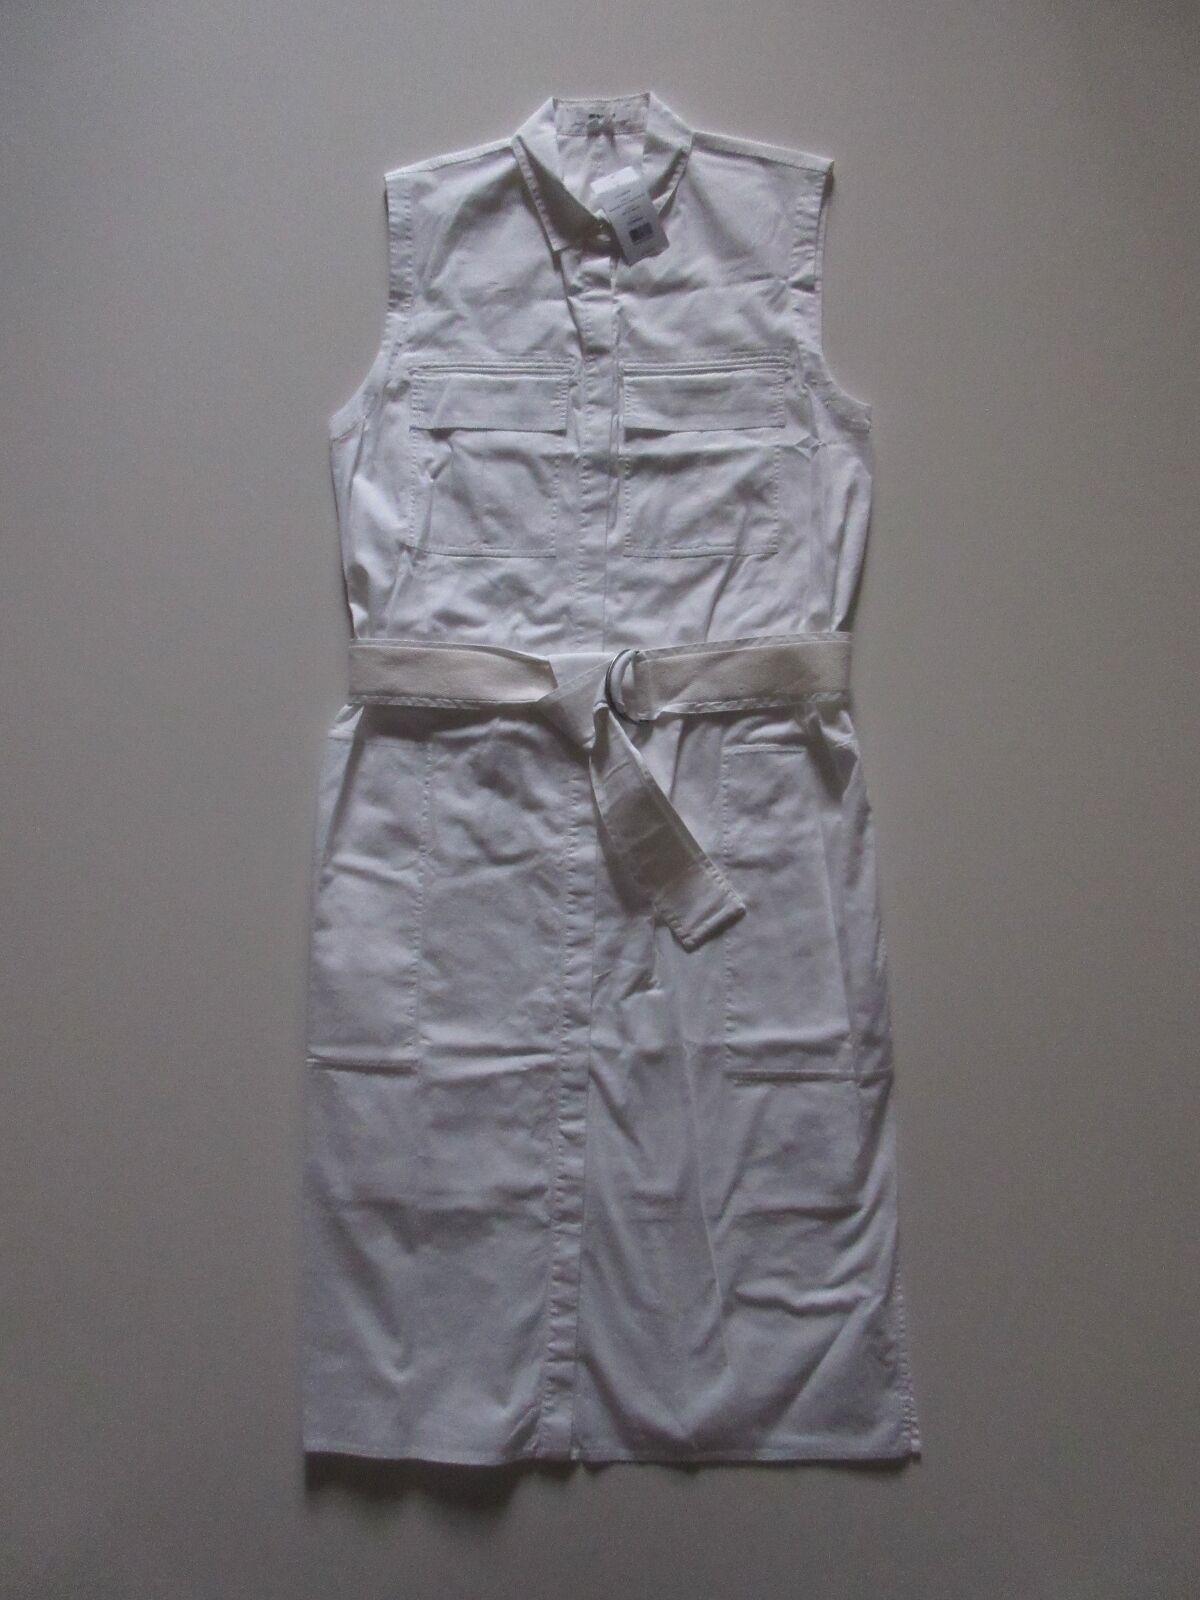 NWT Helmut Lang Optic White Washed Bellow Poplin Cotton Shirt Dress 4